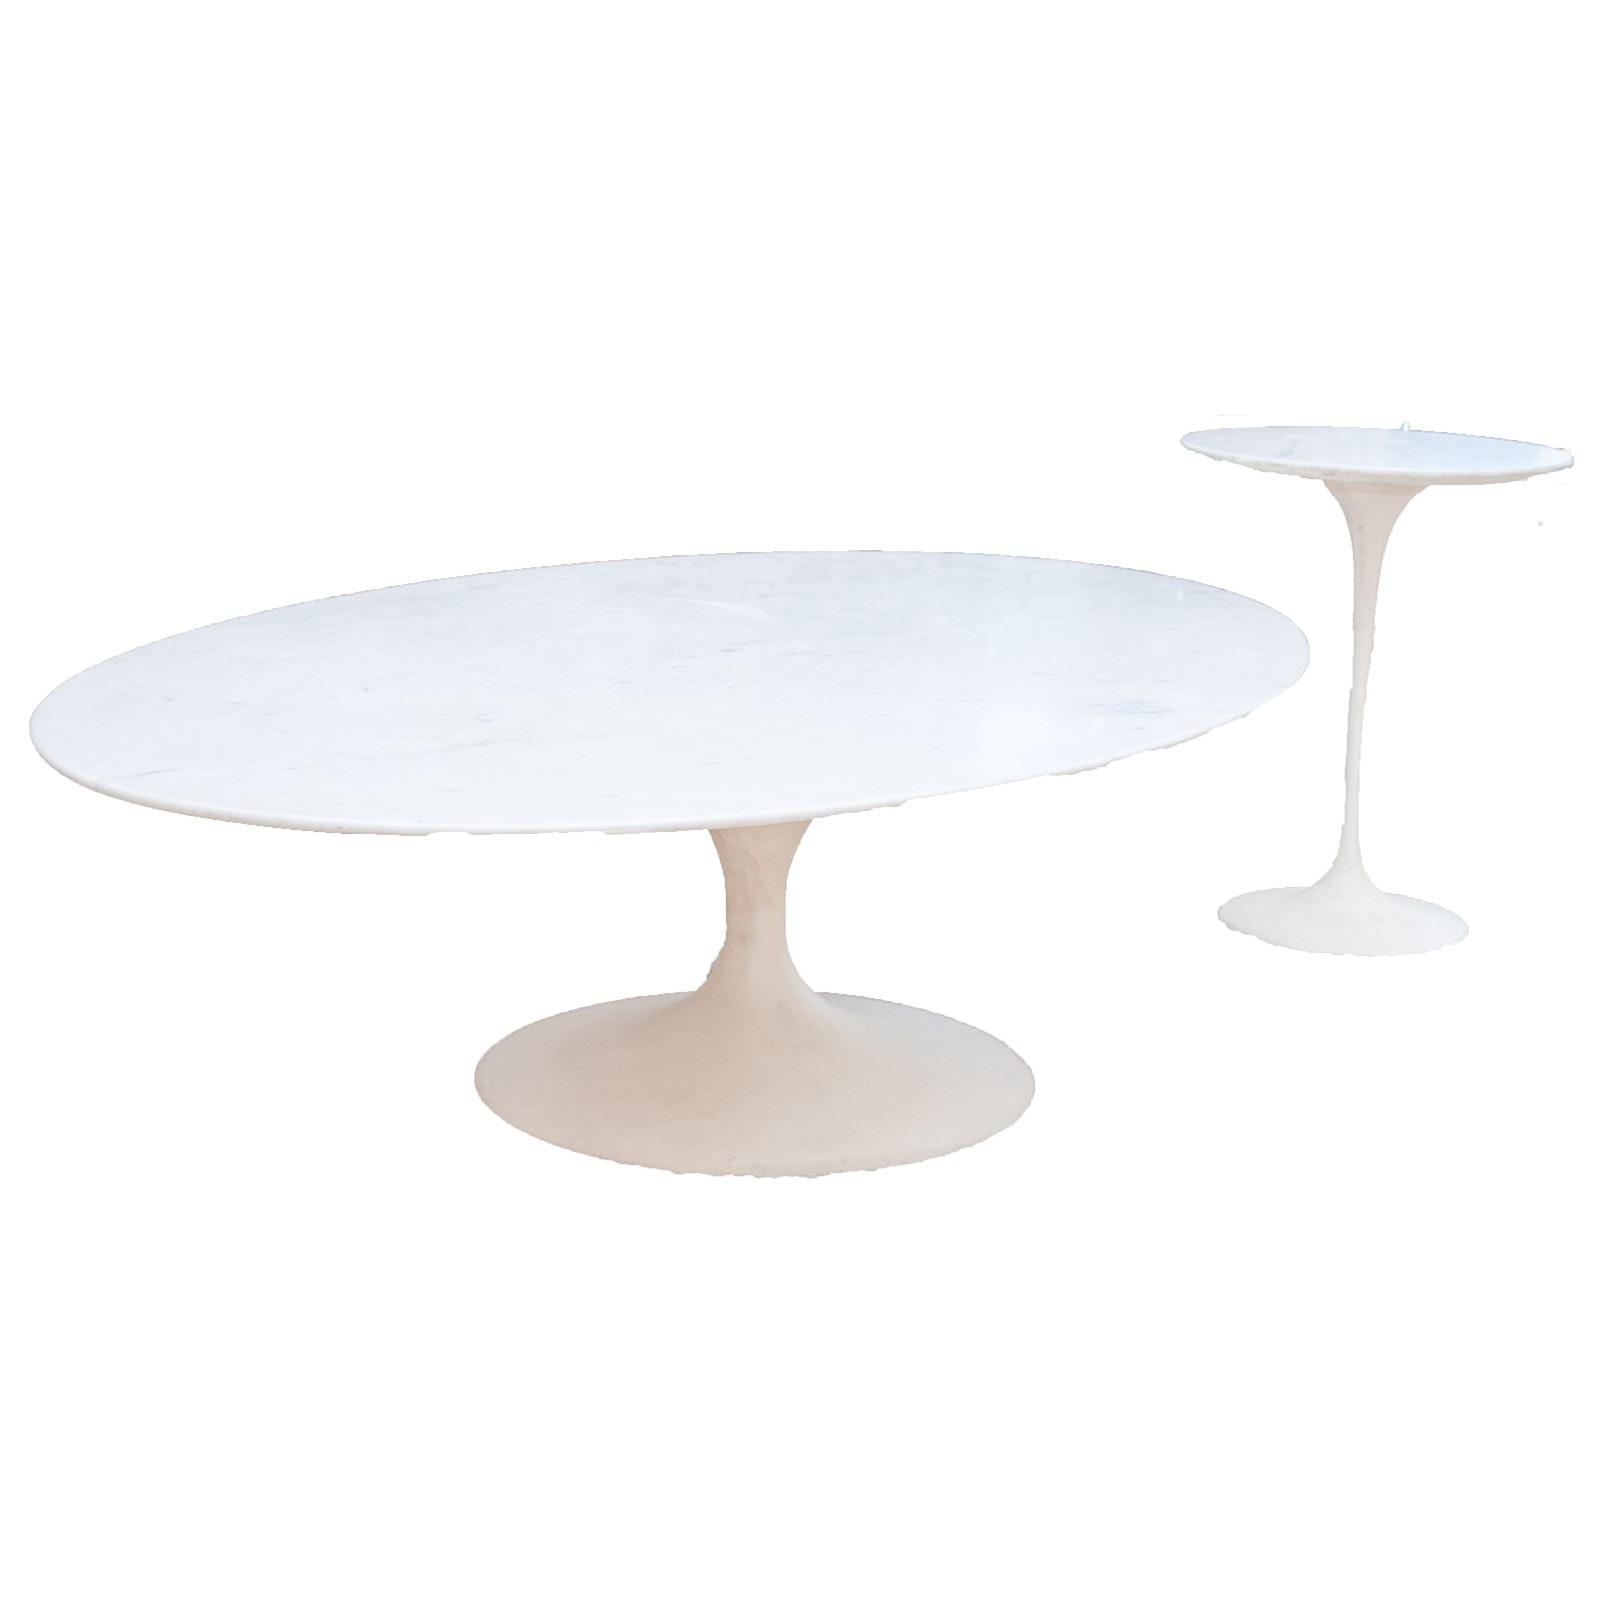 "Eero Saarinen Marble ""Tulip"" Coffee Table & Side Table by Knoll"